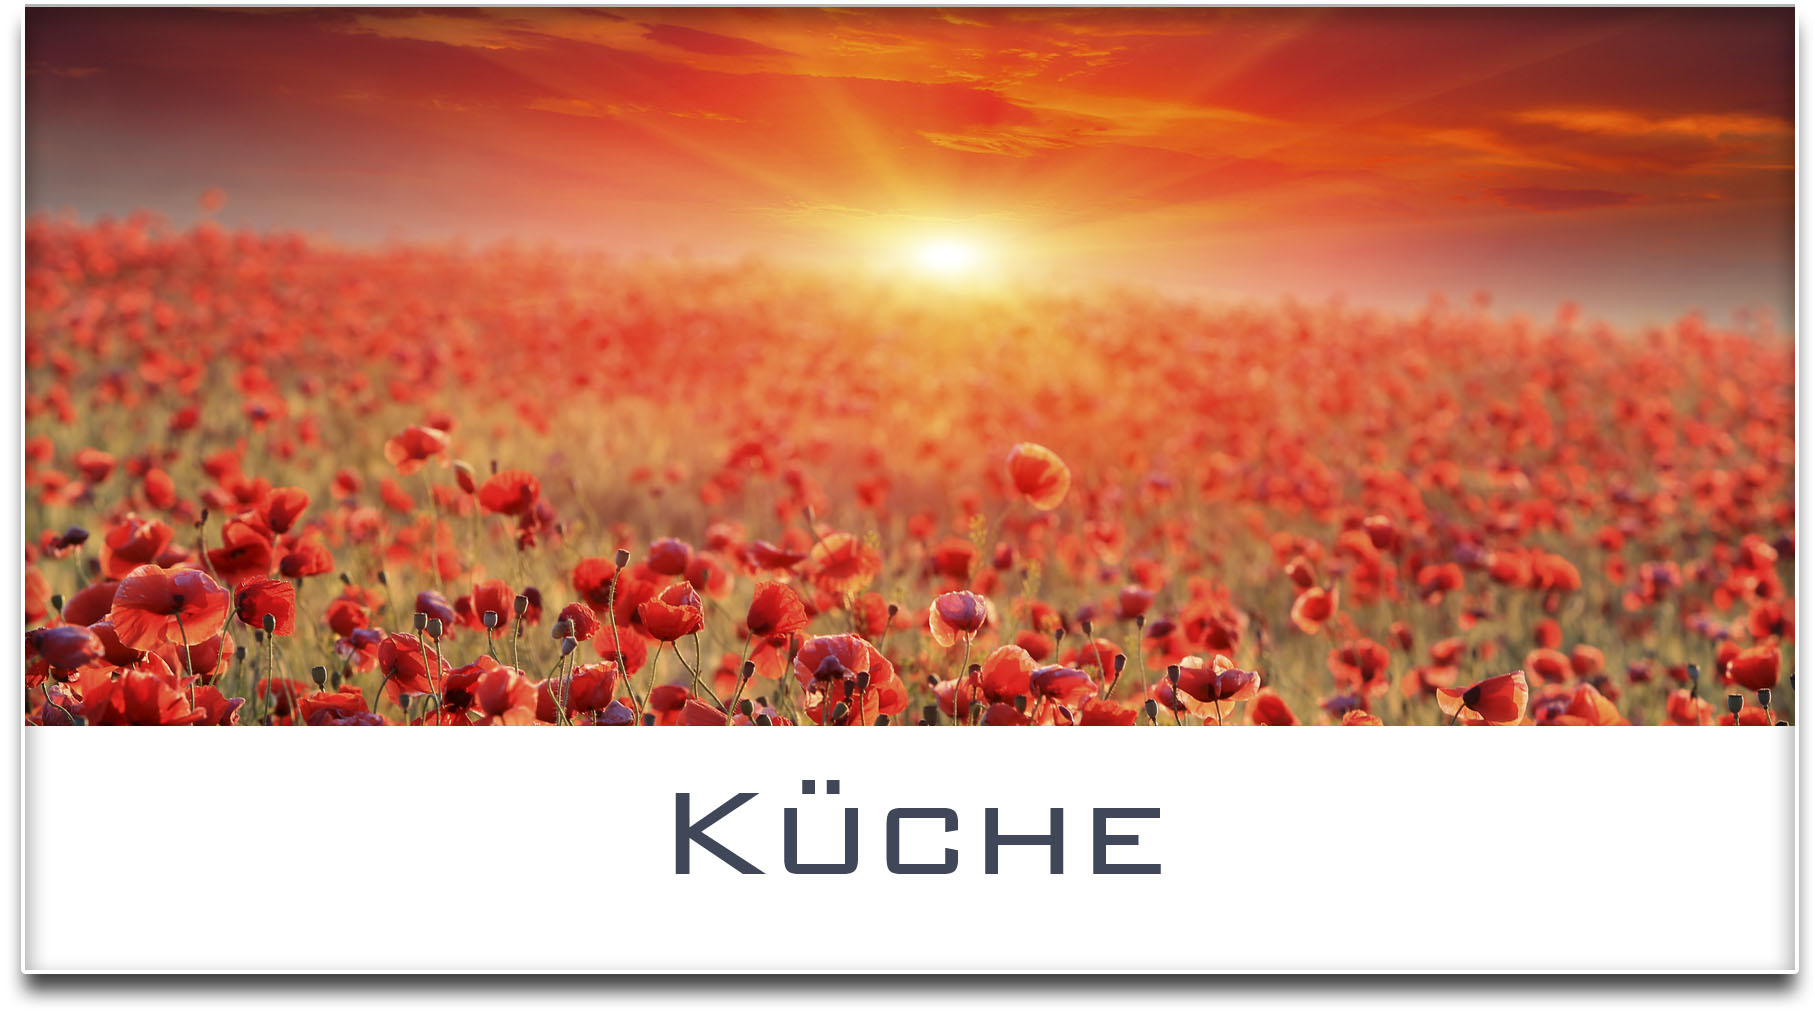 Türschild / Haustürschild / Mohnfeld / Sonnenuntergang / Küche / Selbstklebend